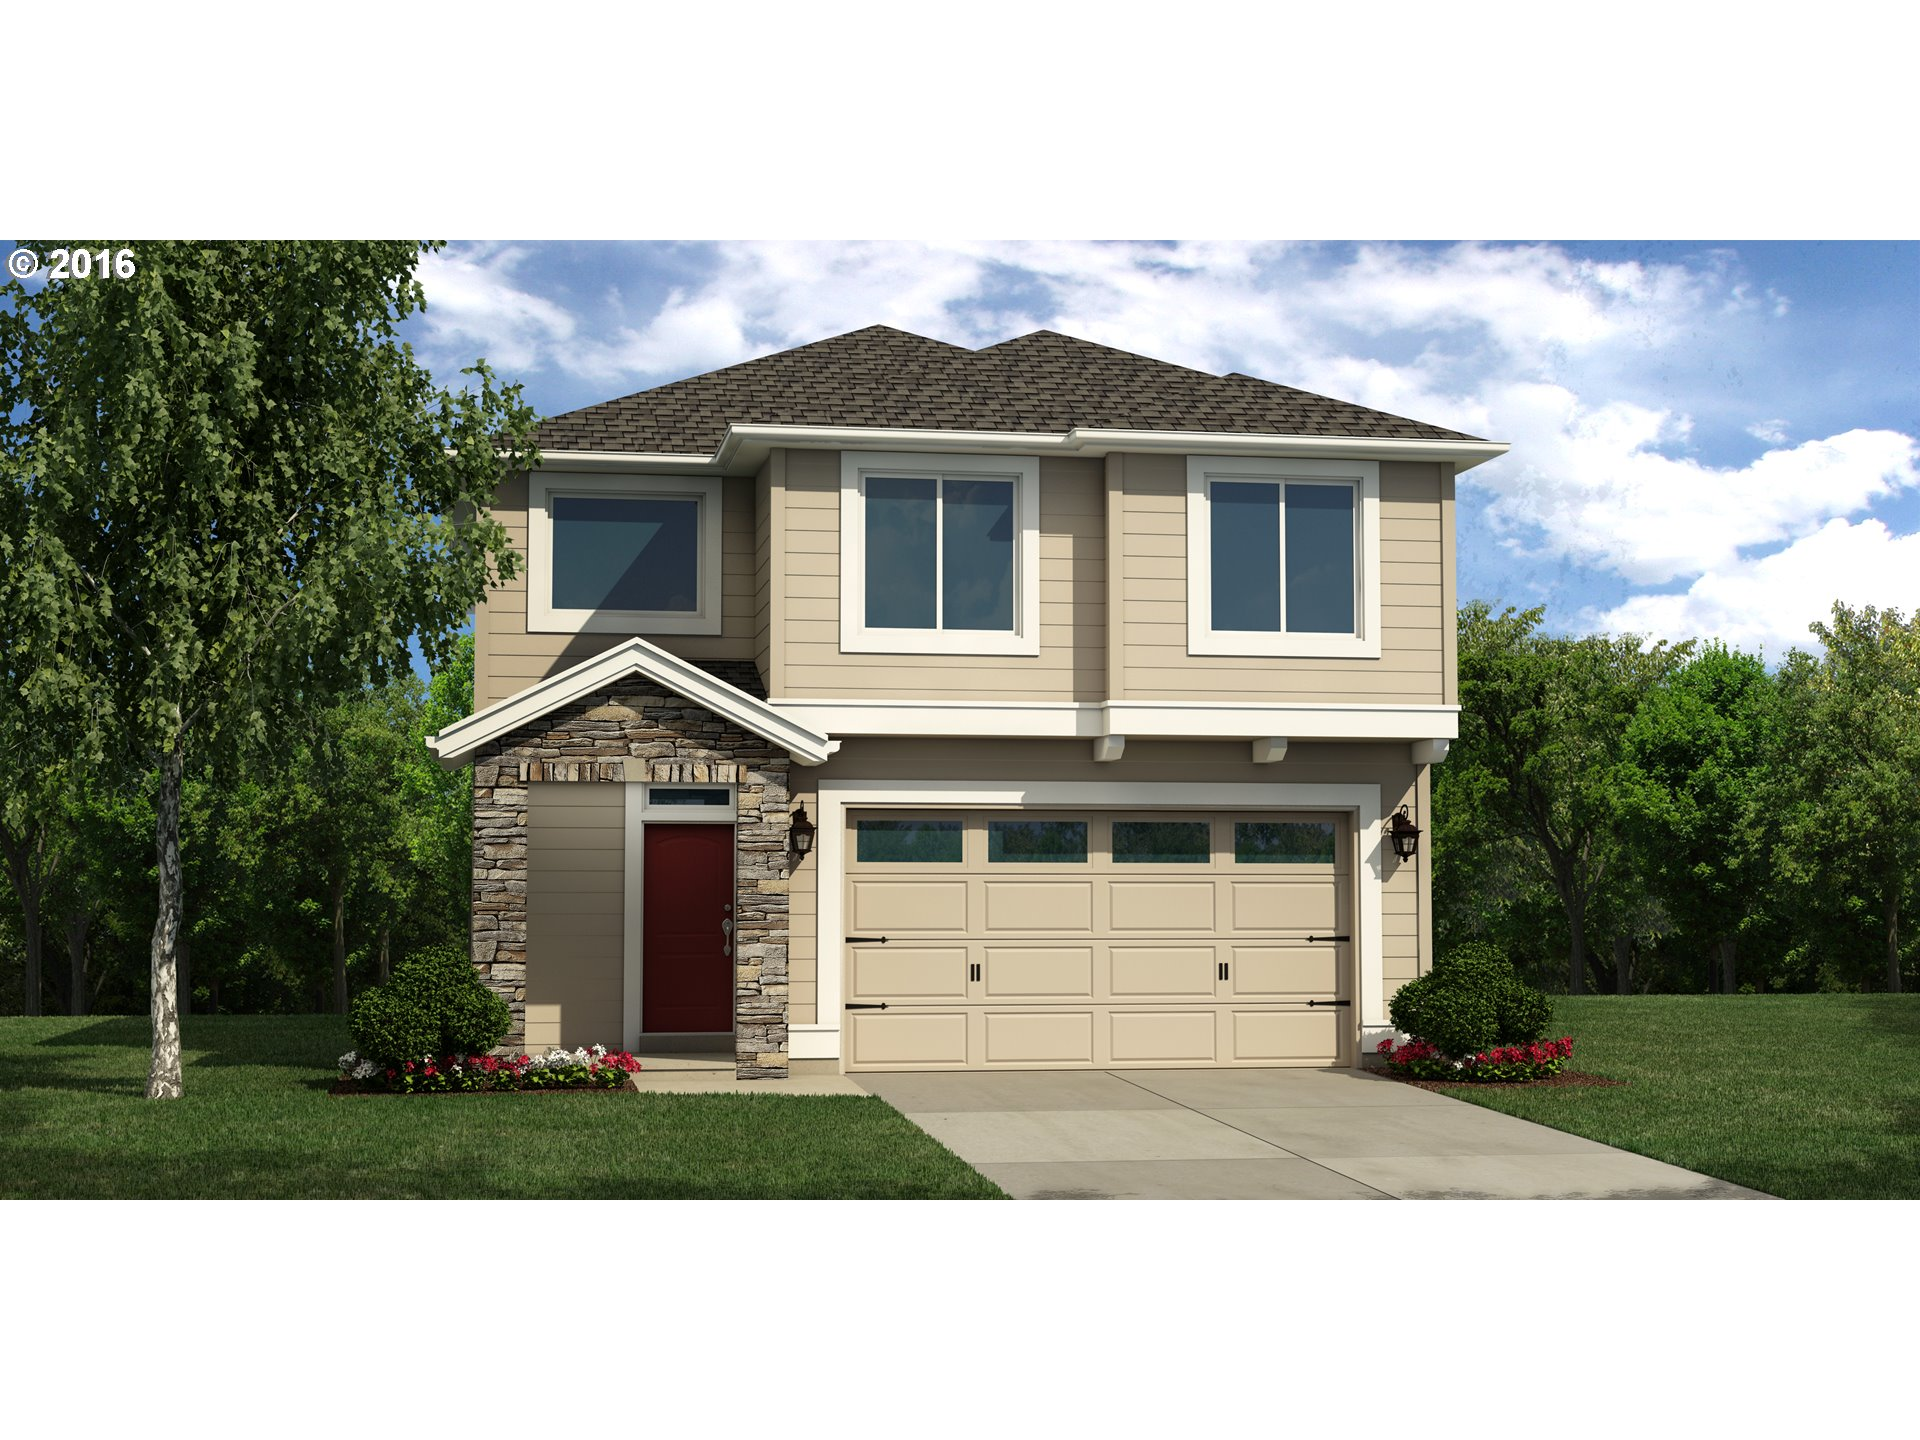 $549,950 - 3Br/3Ba -  for Sale in Jackson Hollow, Hillsboro